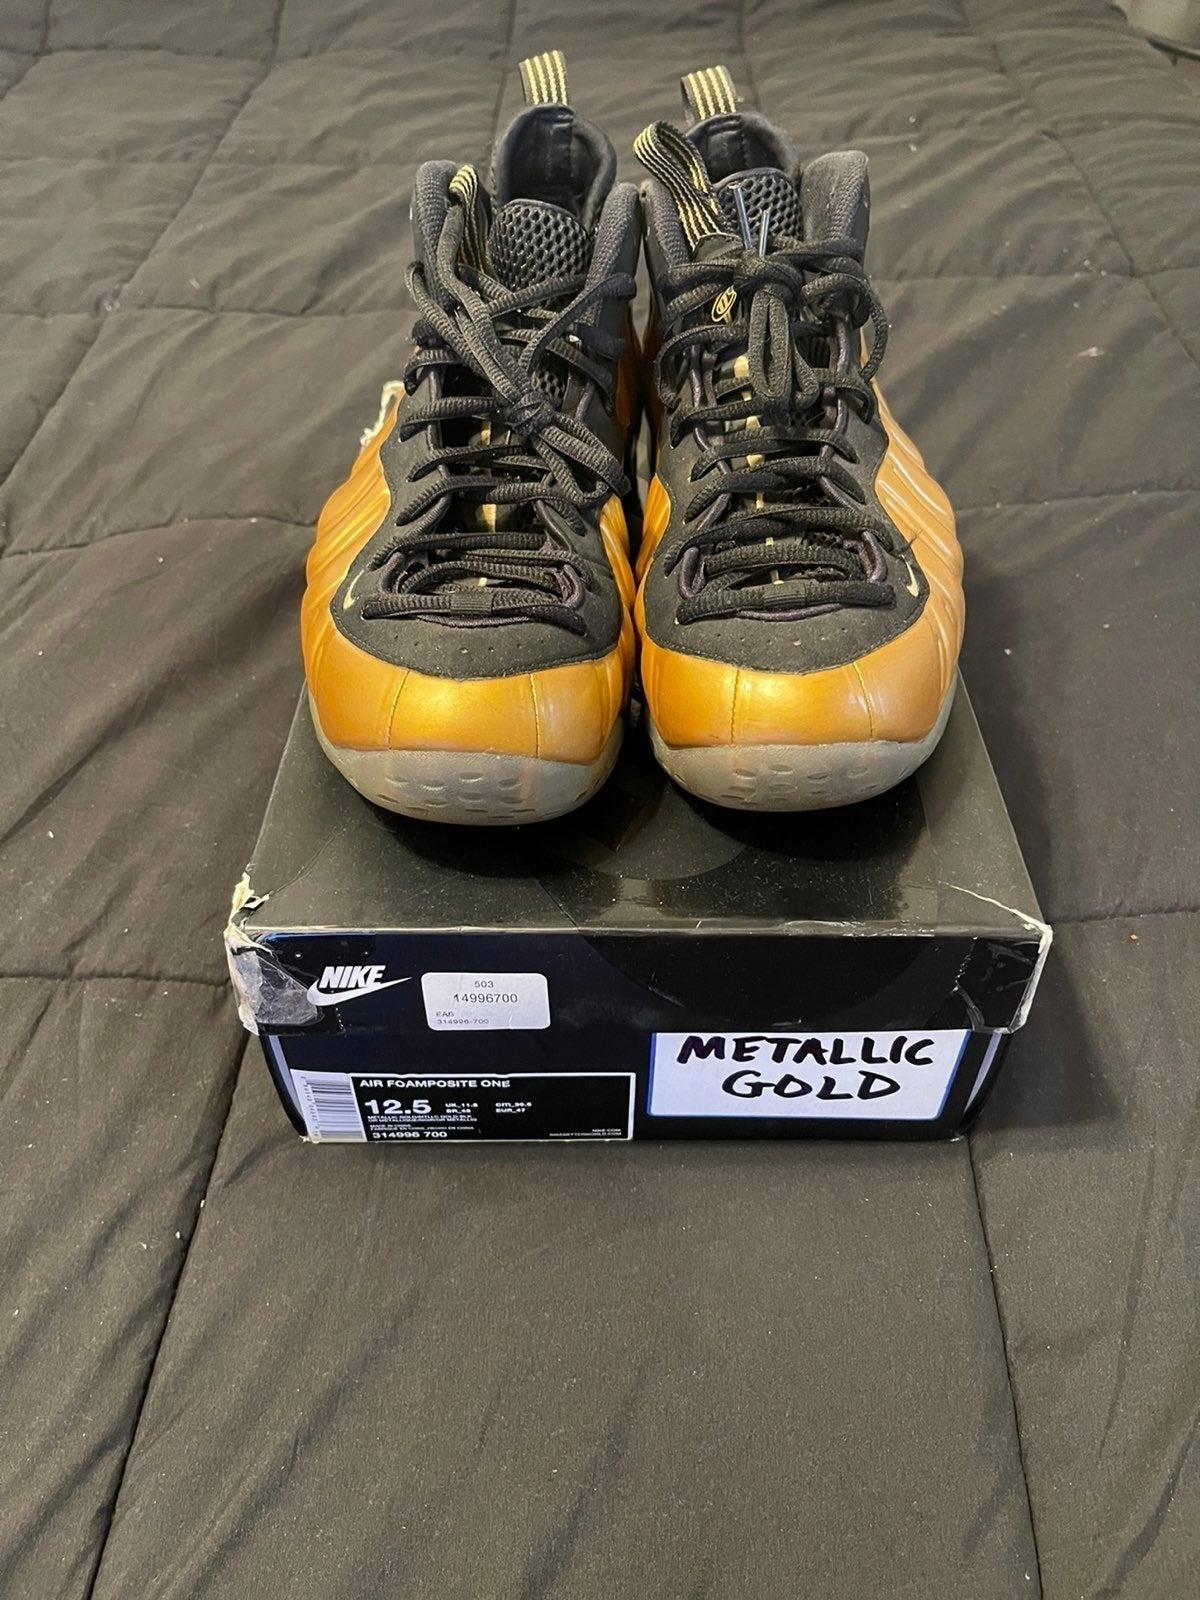 Nike Foamposite Metallic Gold - Sz. 12.5